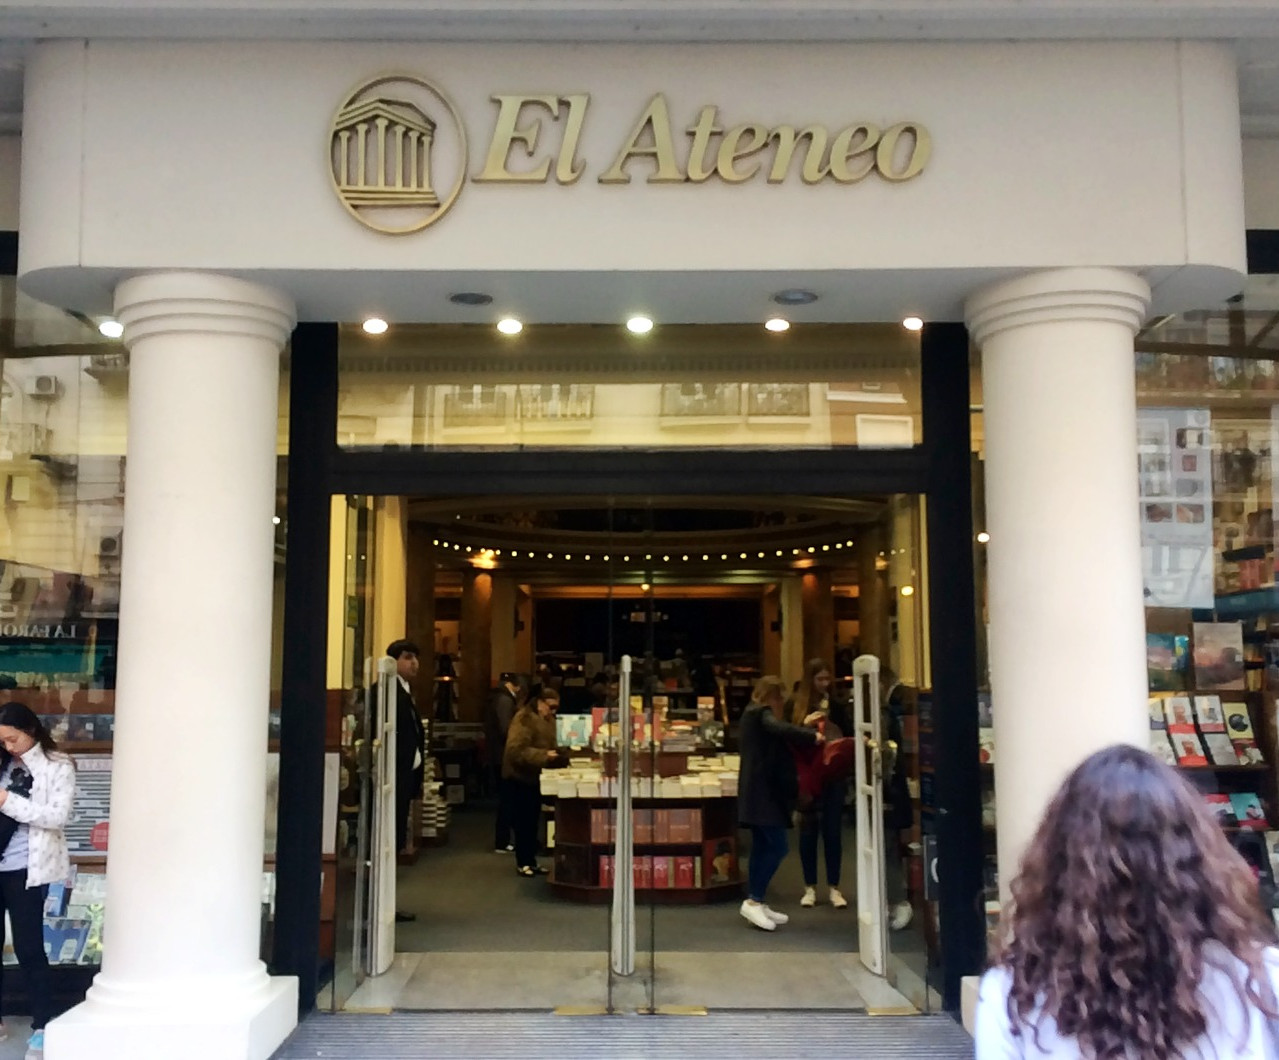 Livraria El Ateneo